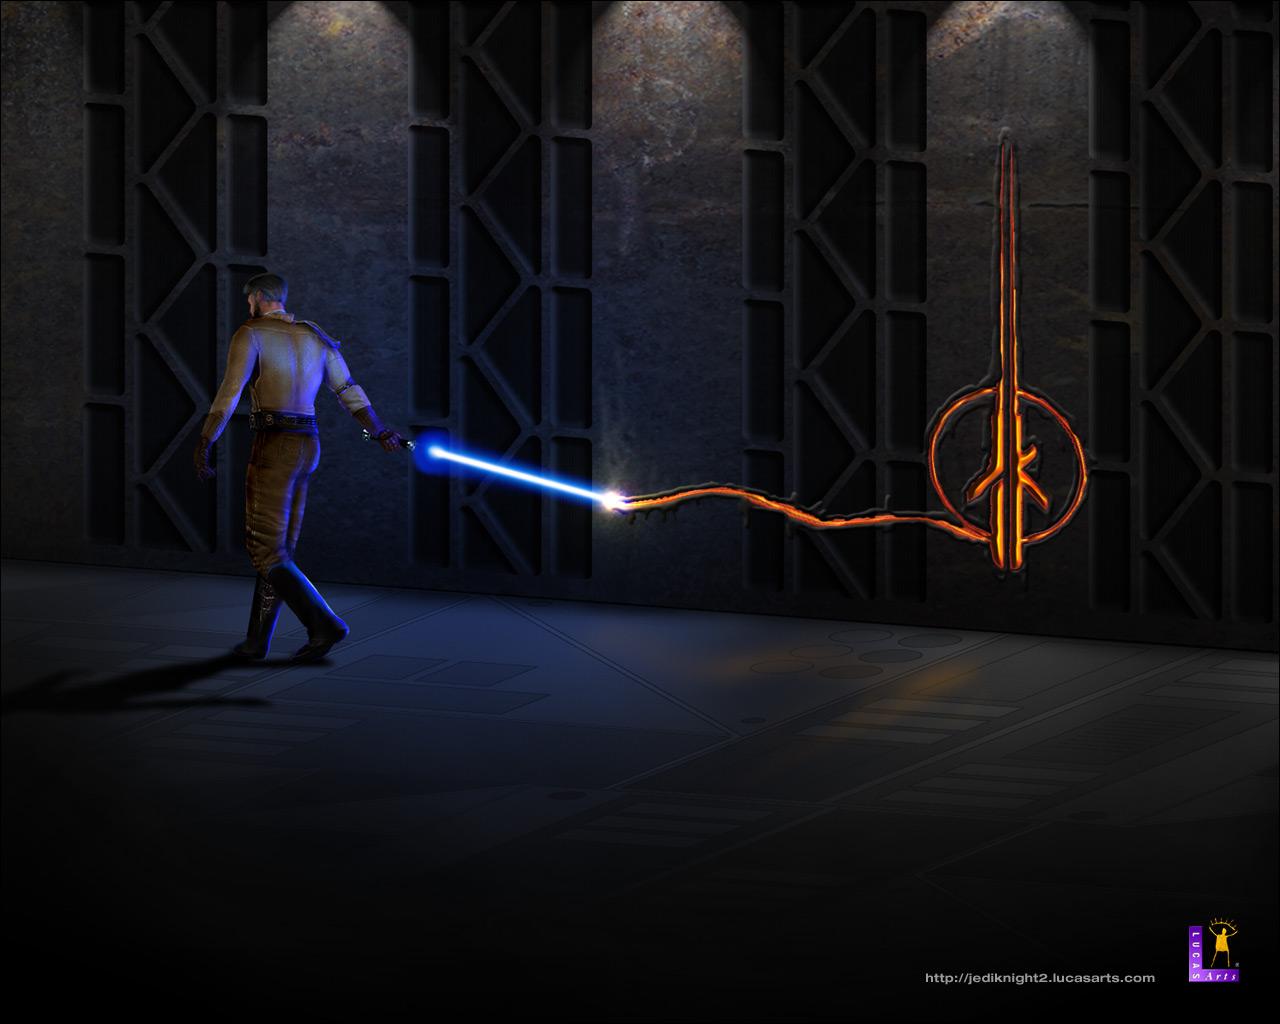 star wars jedi knight ii jedi outcast jk2 jo El código fuente de Jedi